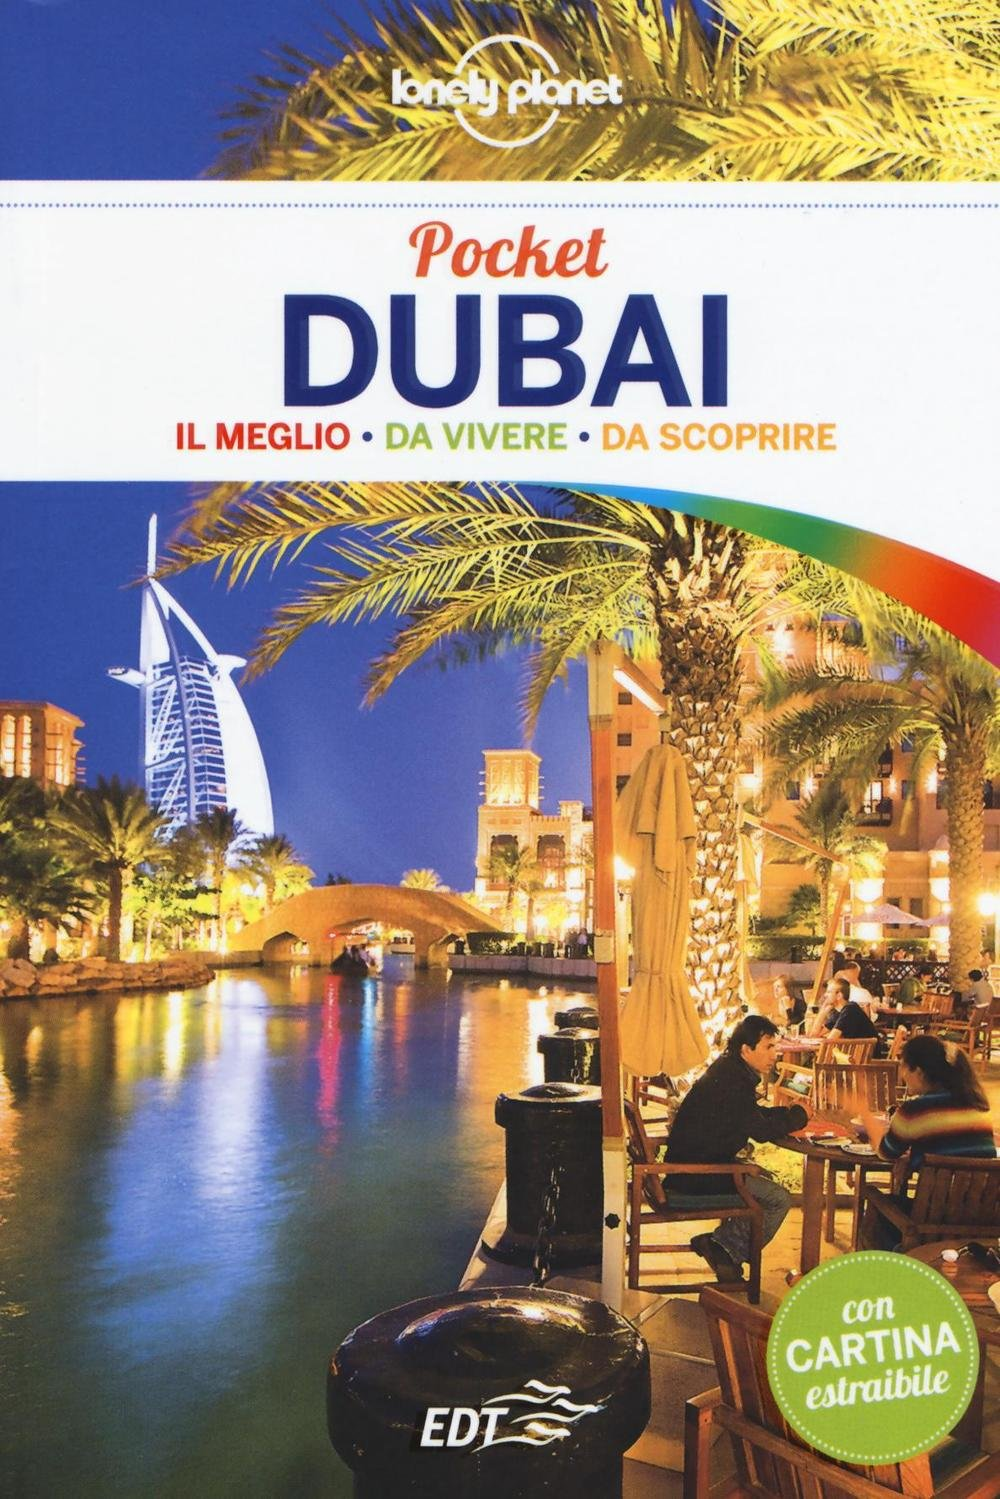 Cartina Mappa Turistica Dubai.Amazon It Dubai Con Cartina Schulte Peevers Andrea Dapino Cesare Vargiu Riccardo James Libri